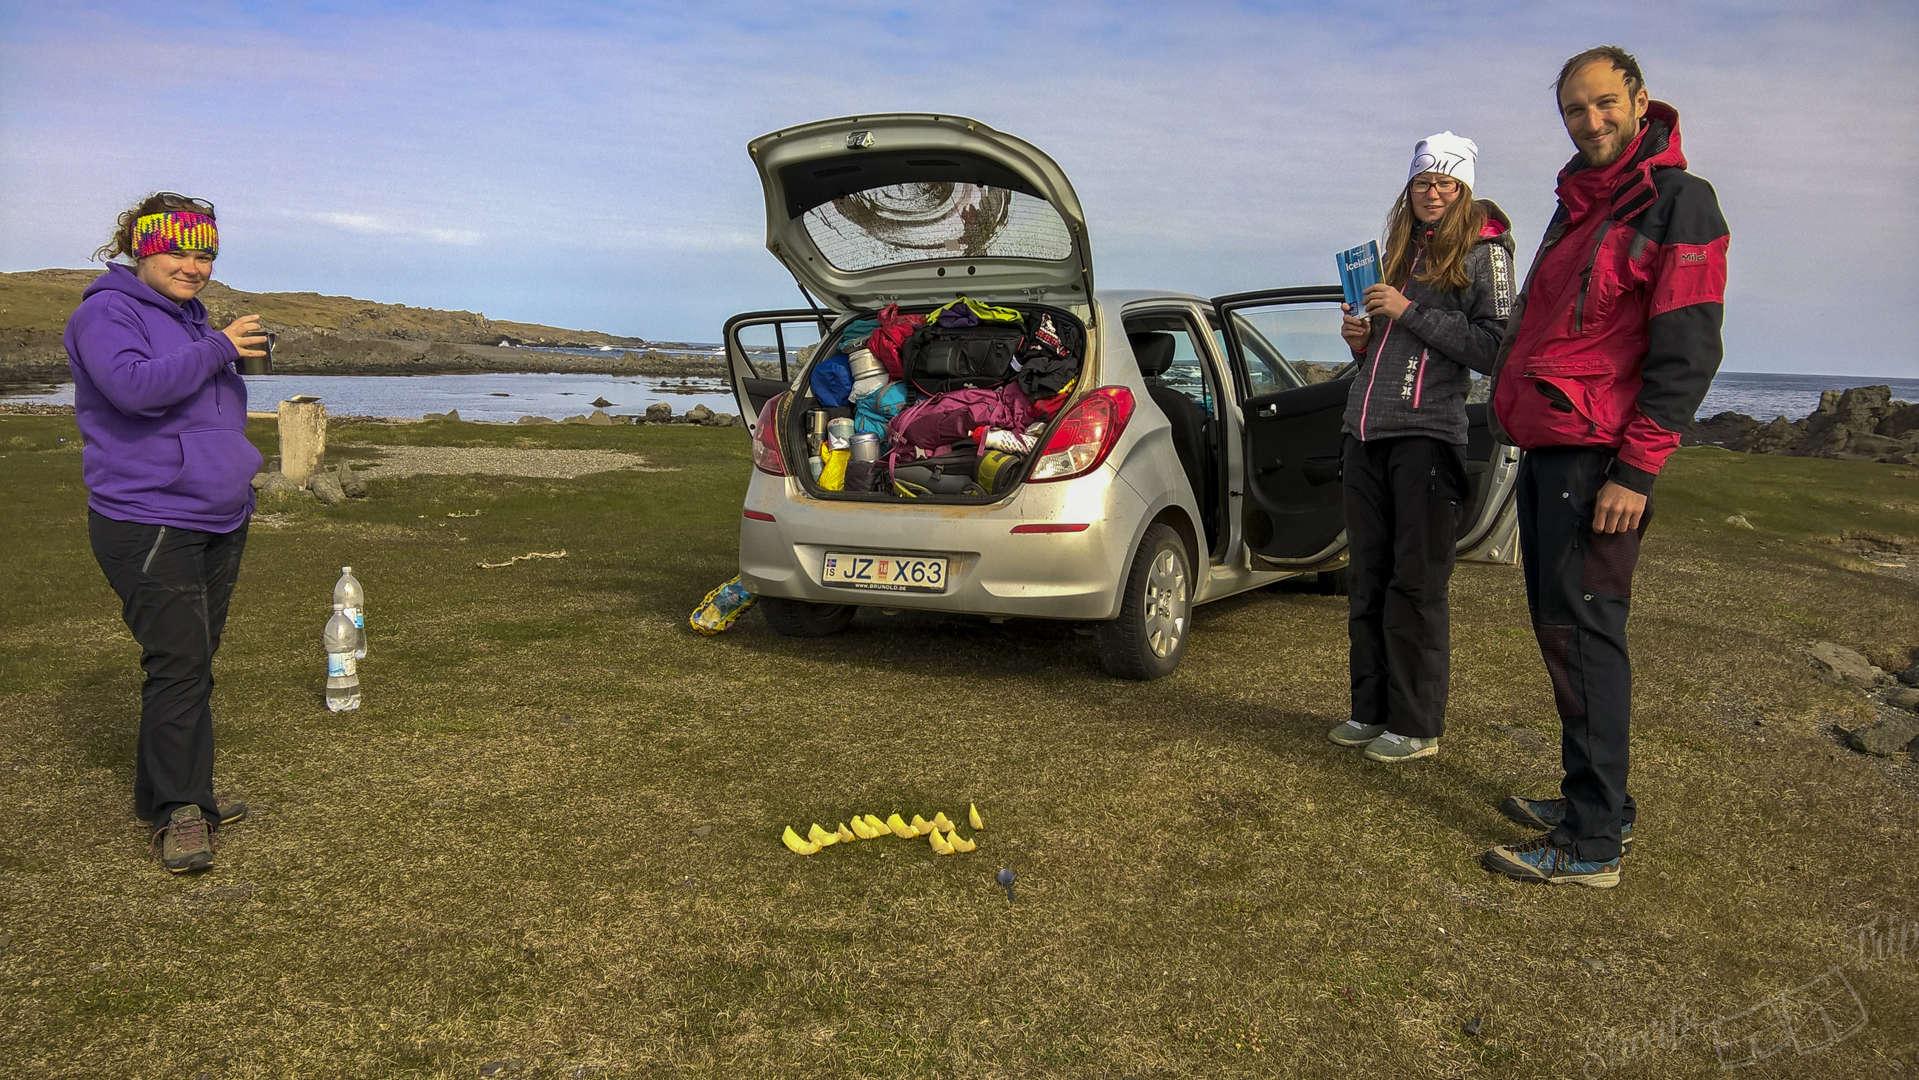 iceland car rental, tiny car iceland, iceland travel by car, iceland budget car, iceland cheap car